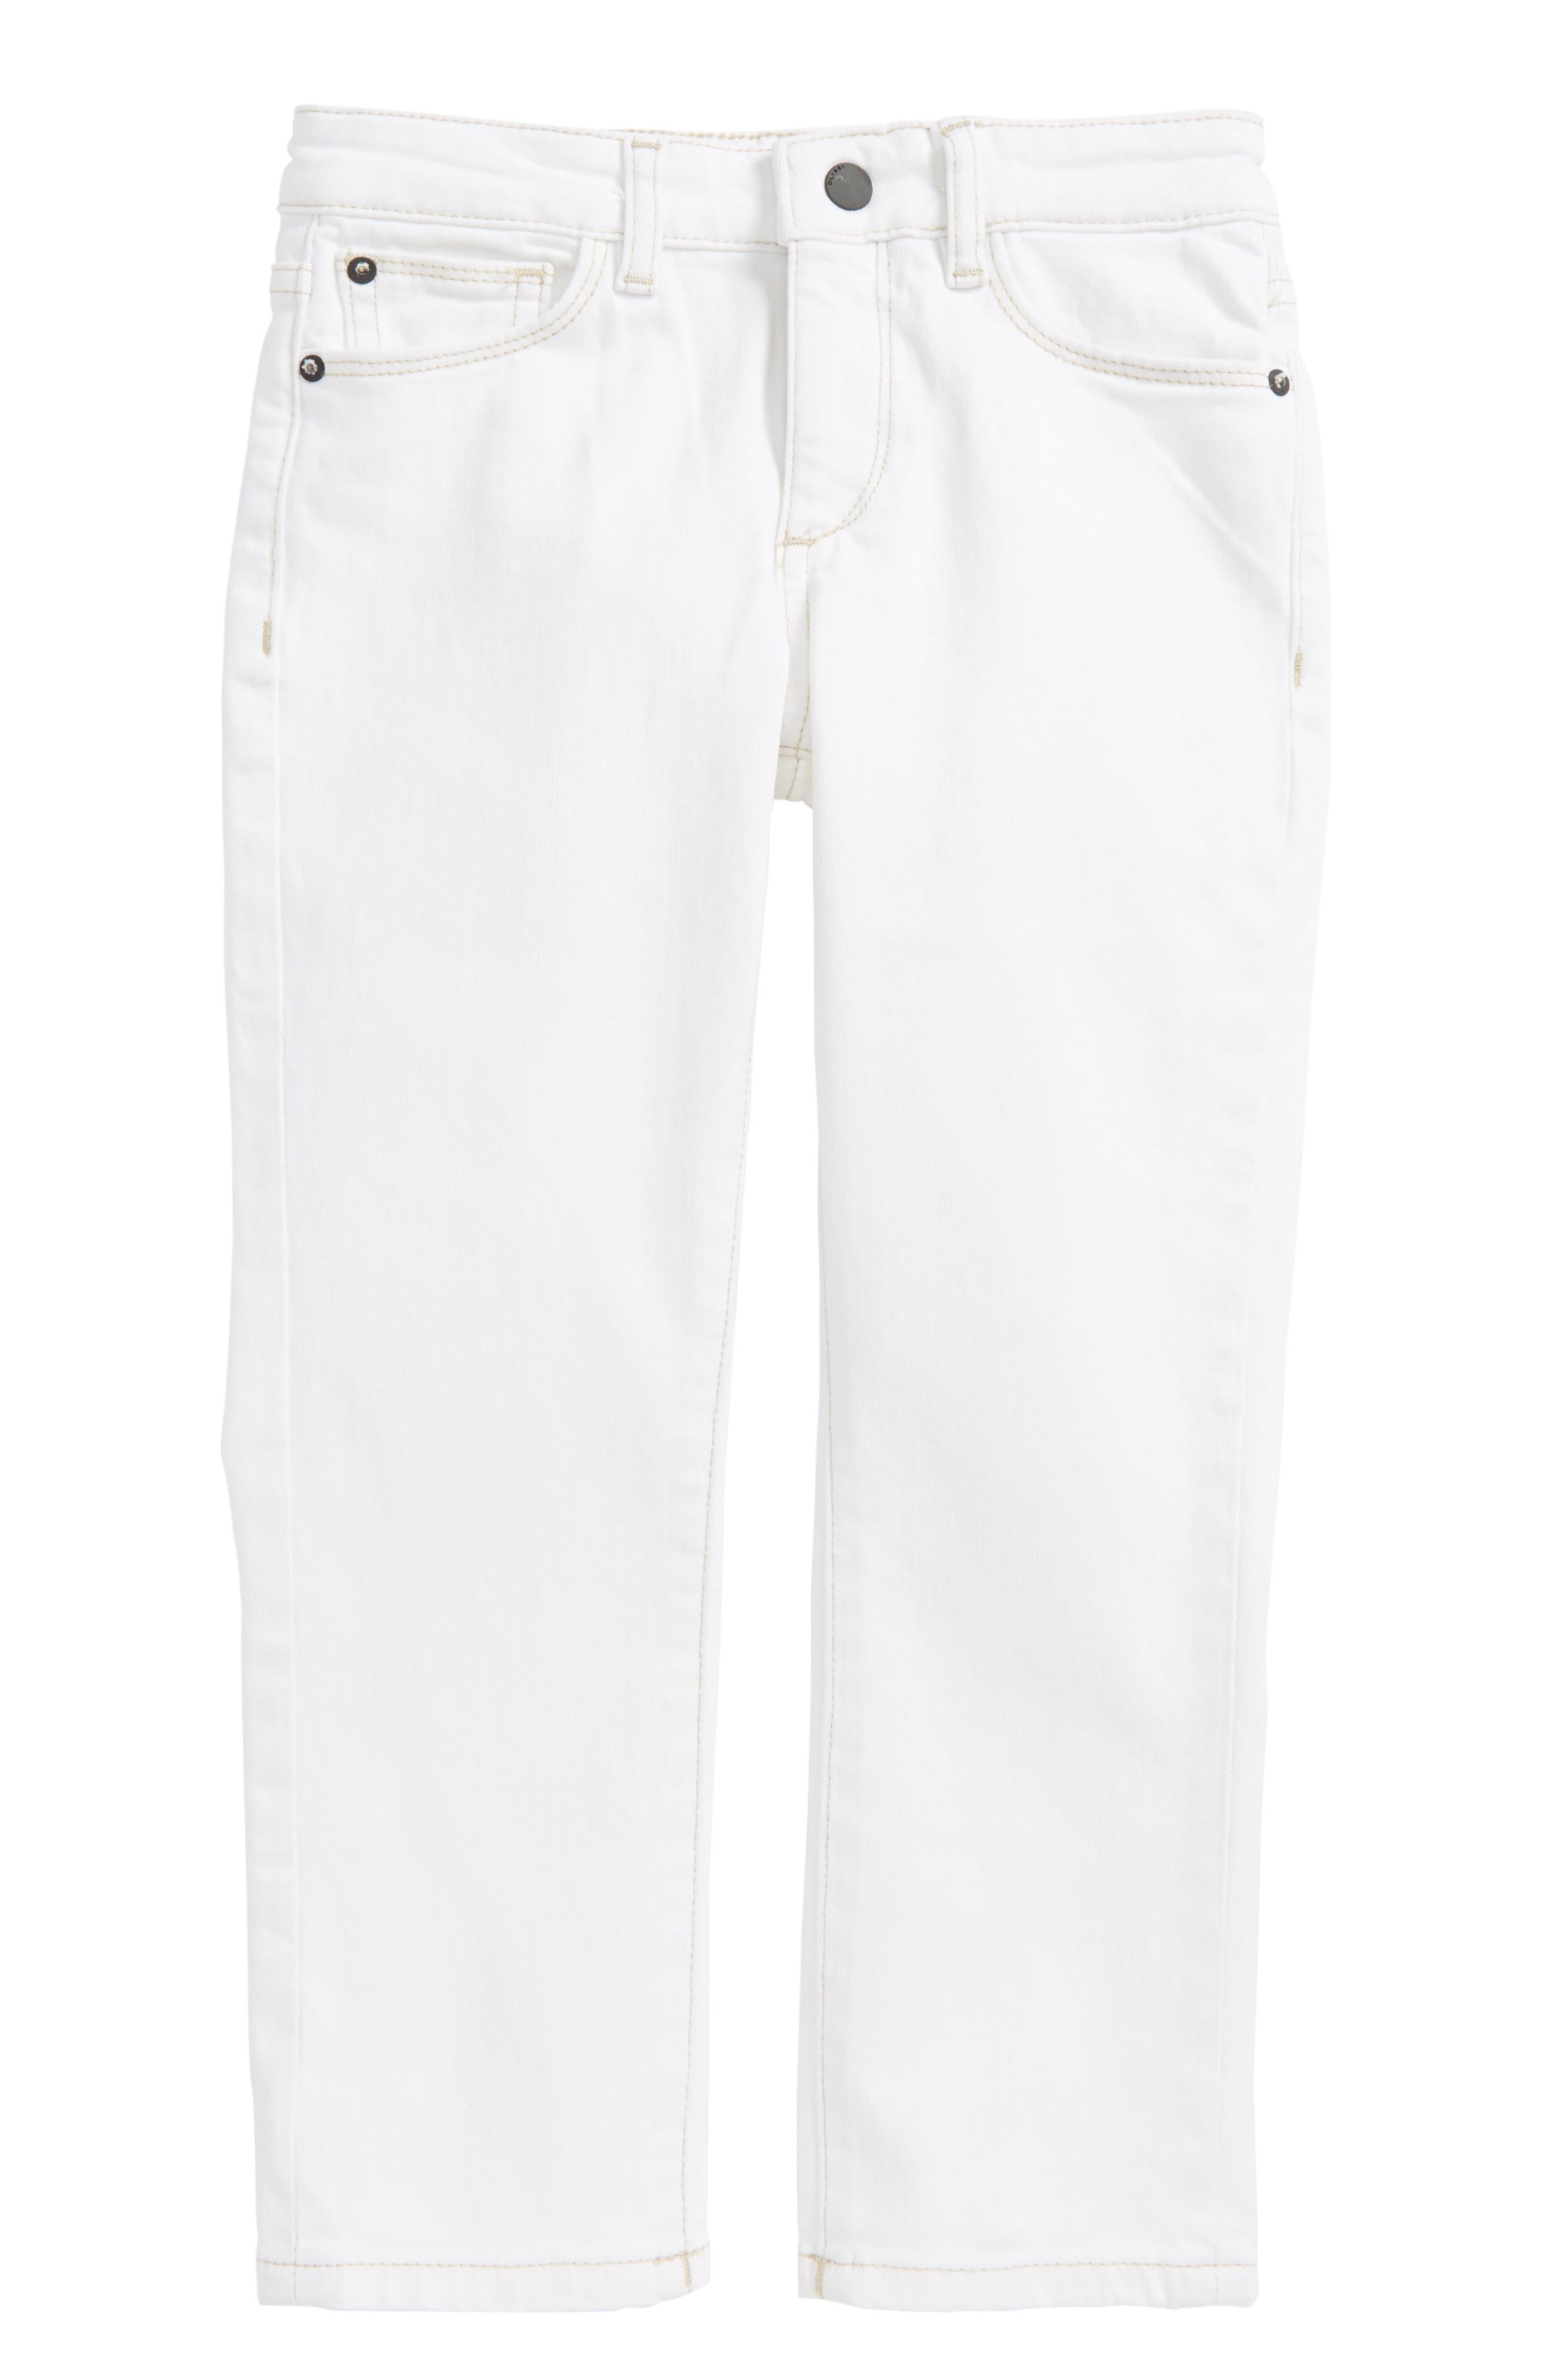 Brady Slim Fit Straight Leg Jeans,                             Main thumbnail 1, color,                             100